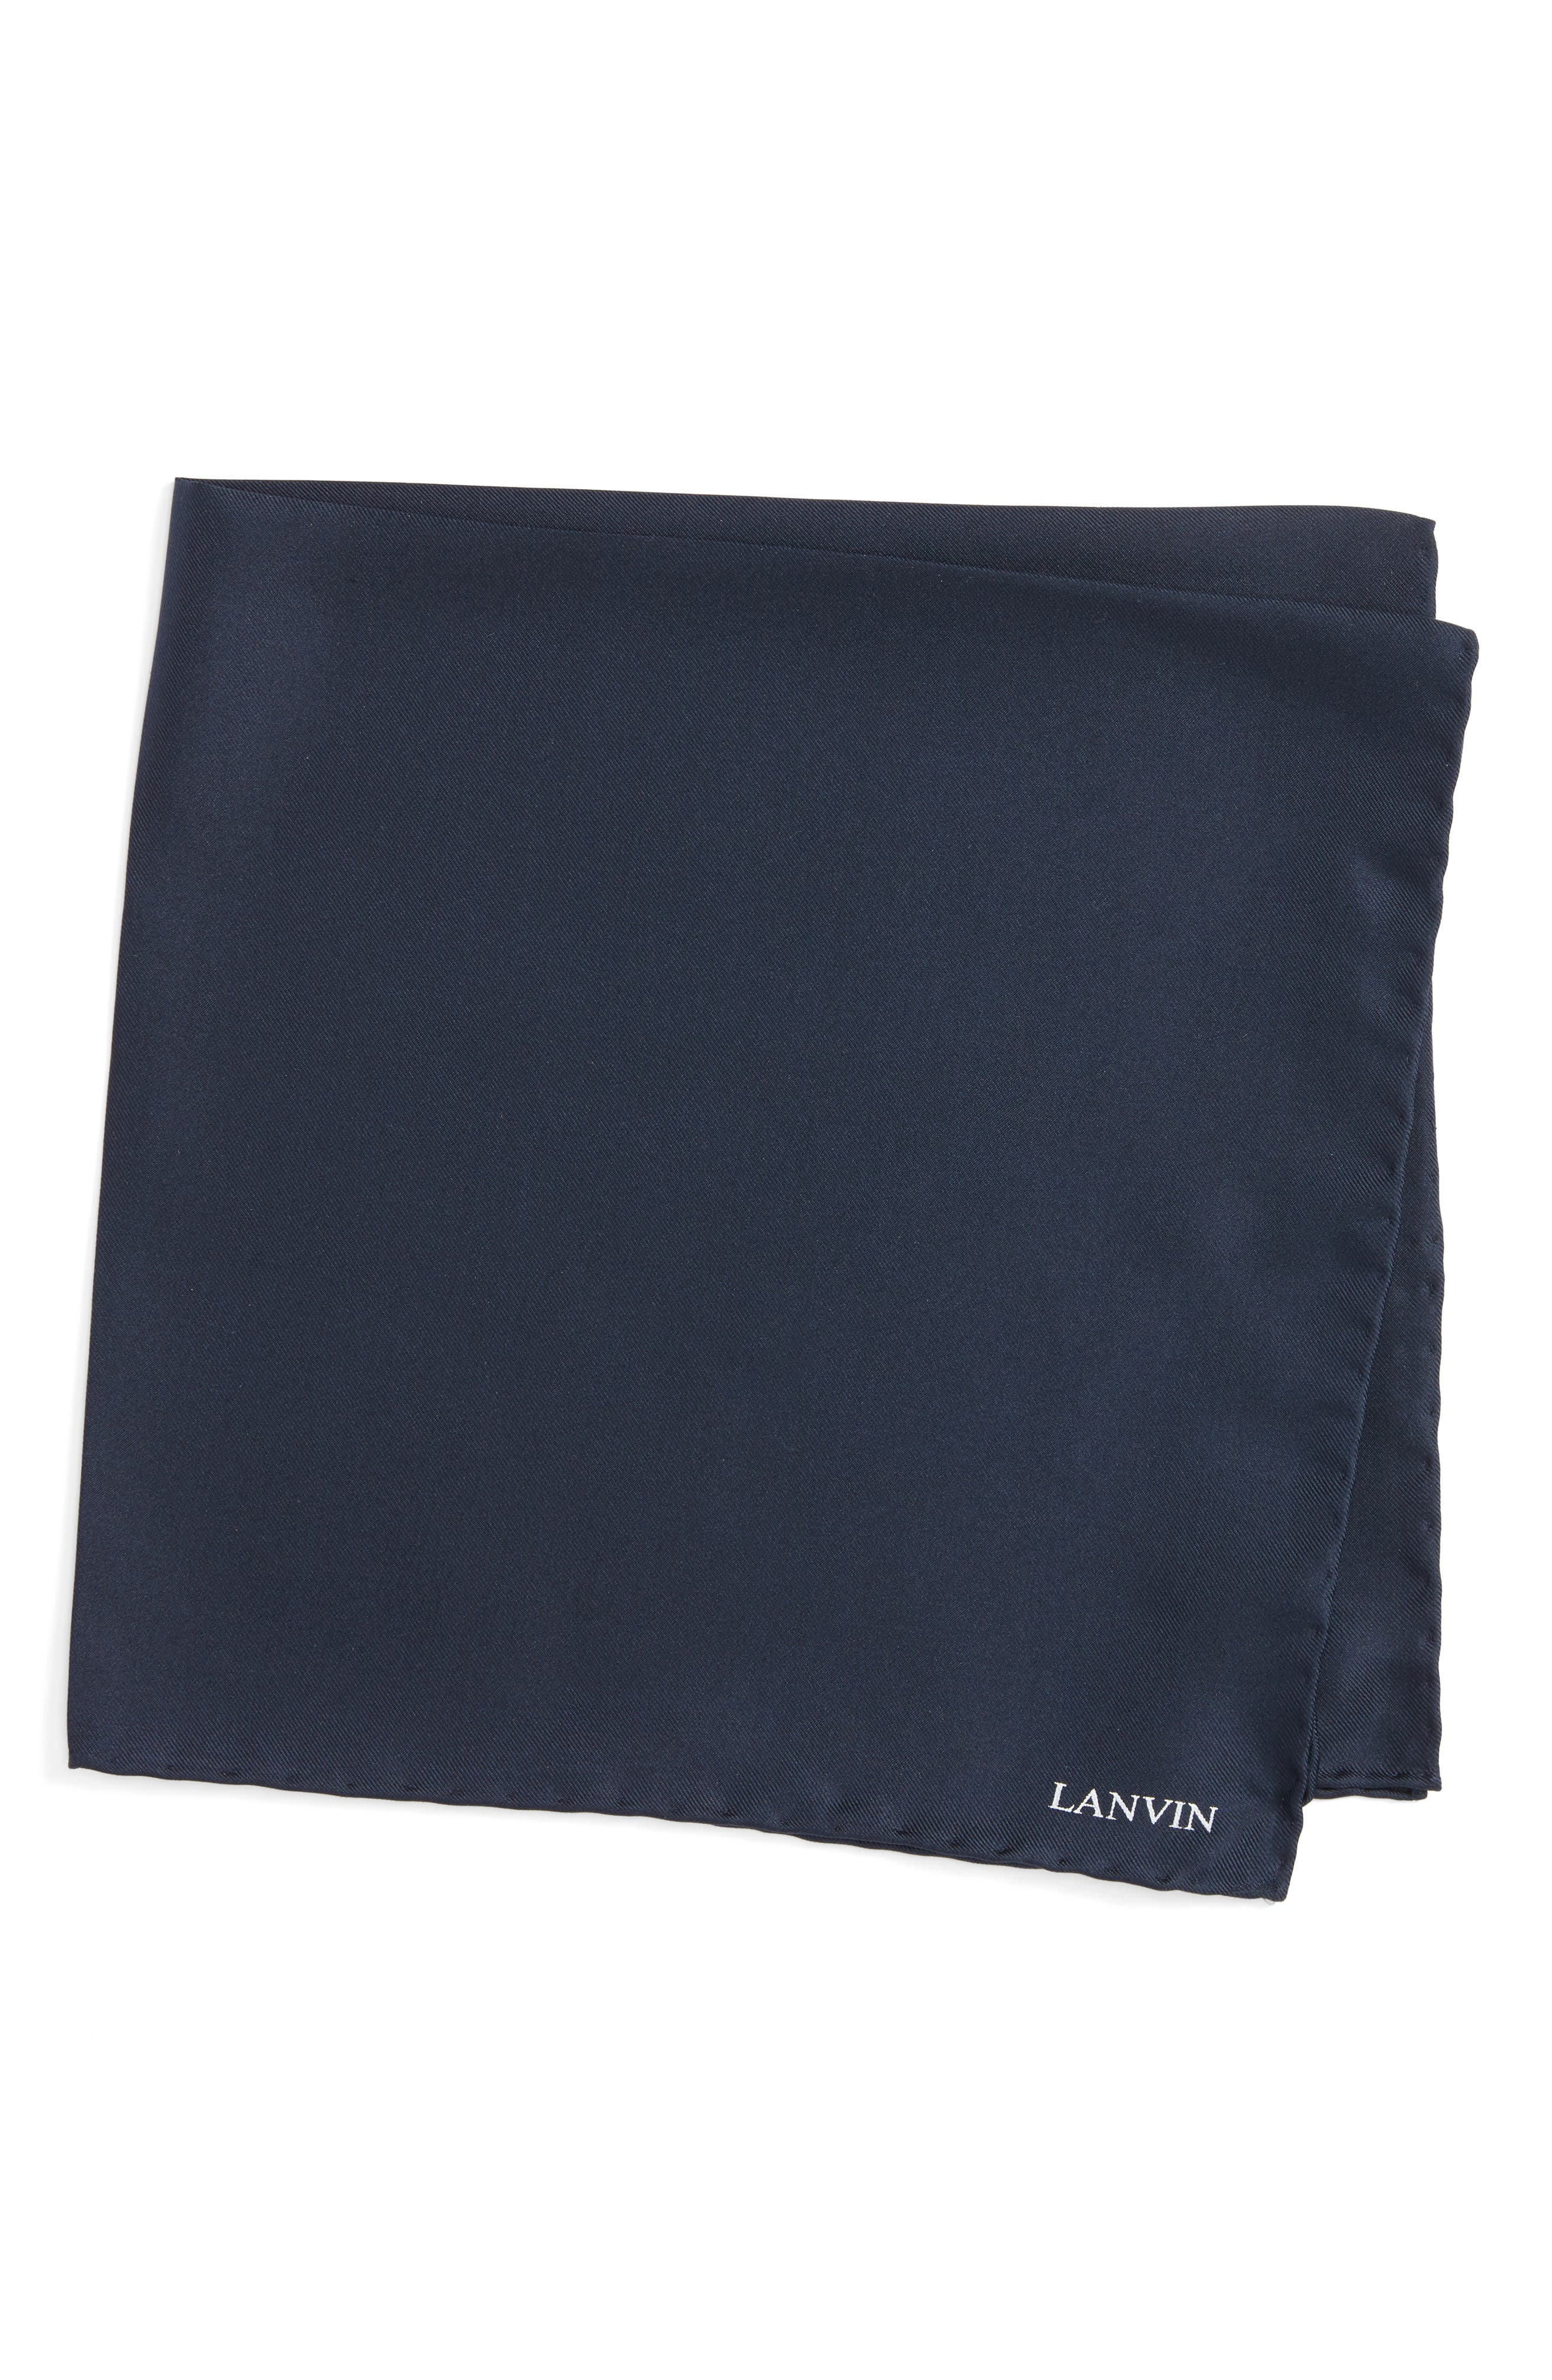 Lanvin Solid Silk Pocket Square